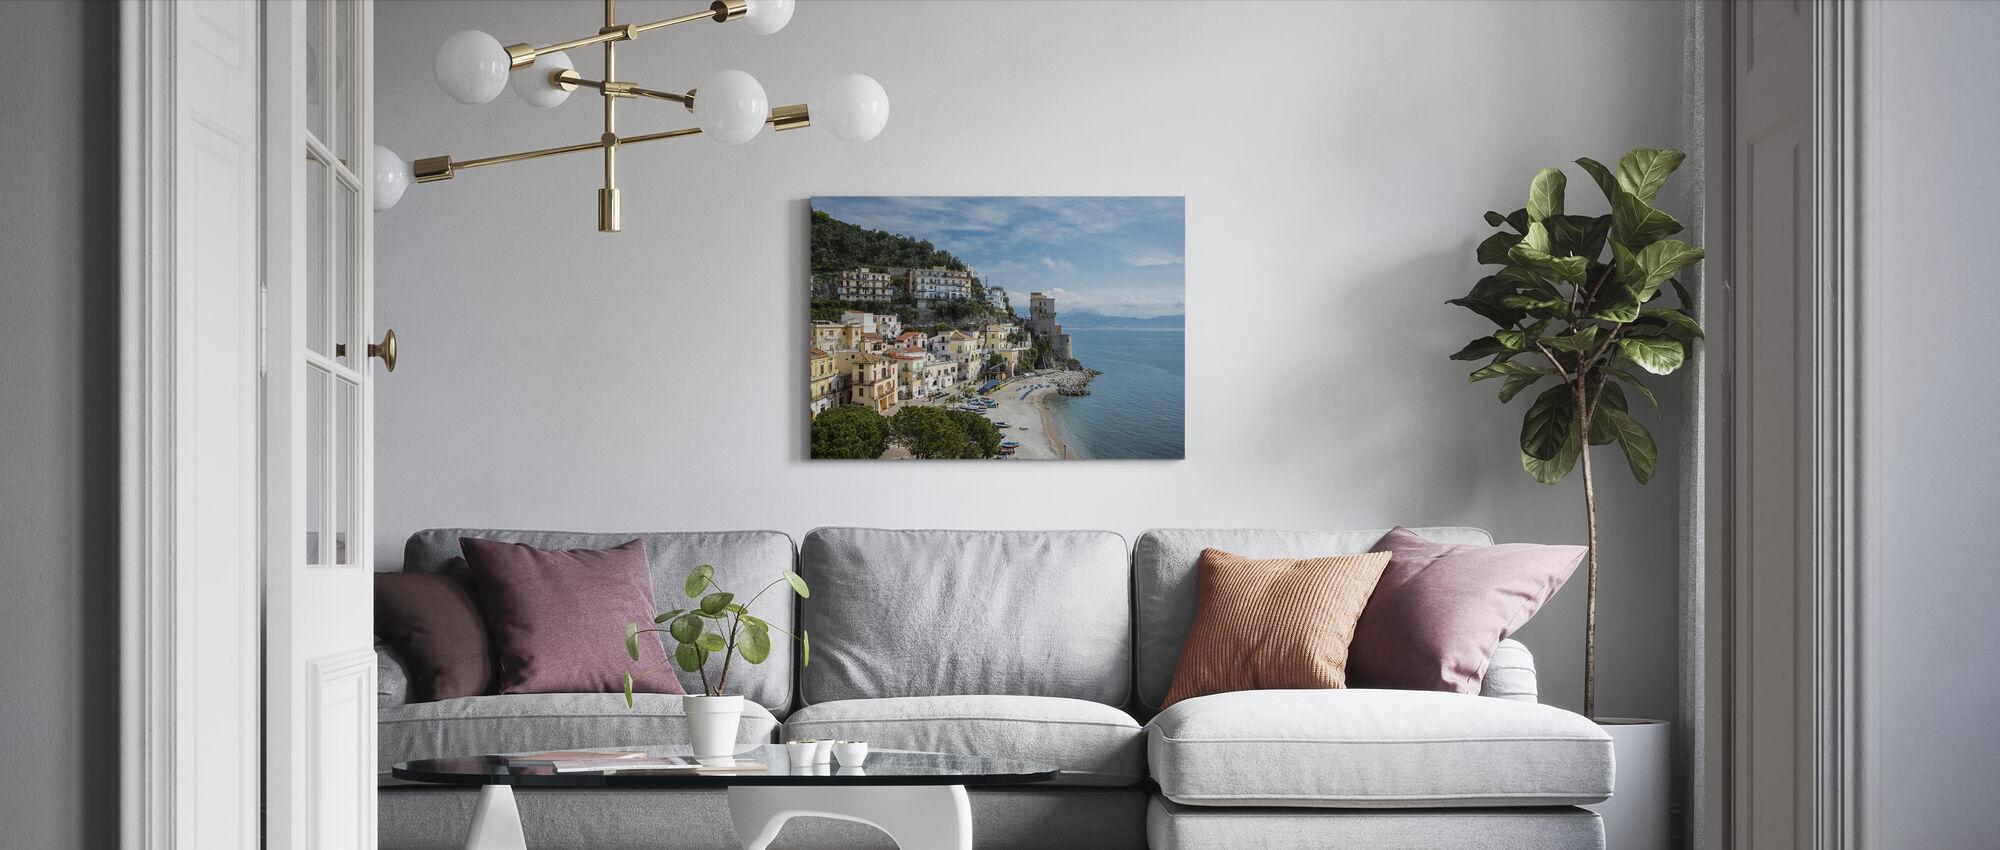 Amalfi-kust - Canvas print - Woonkamer